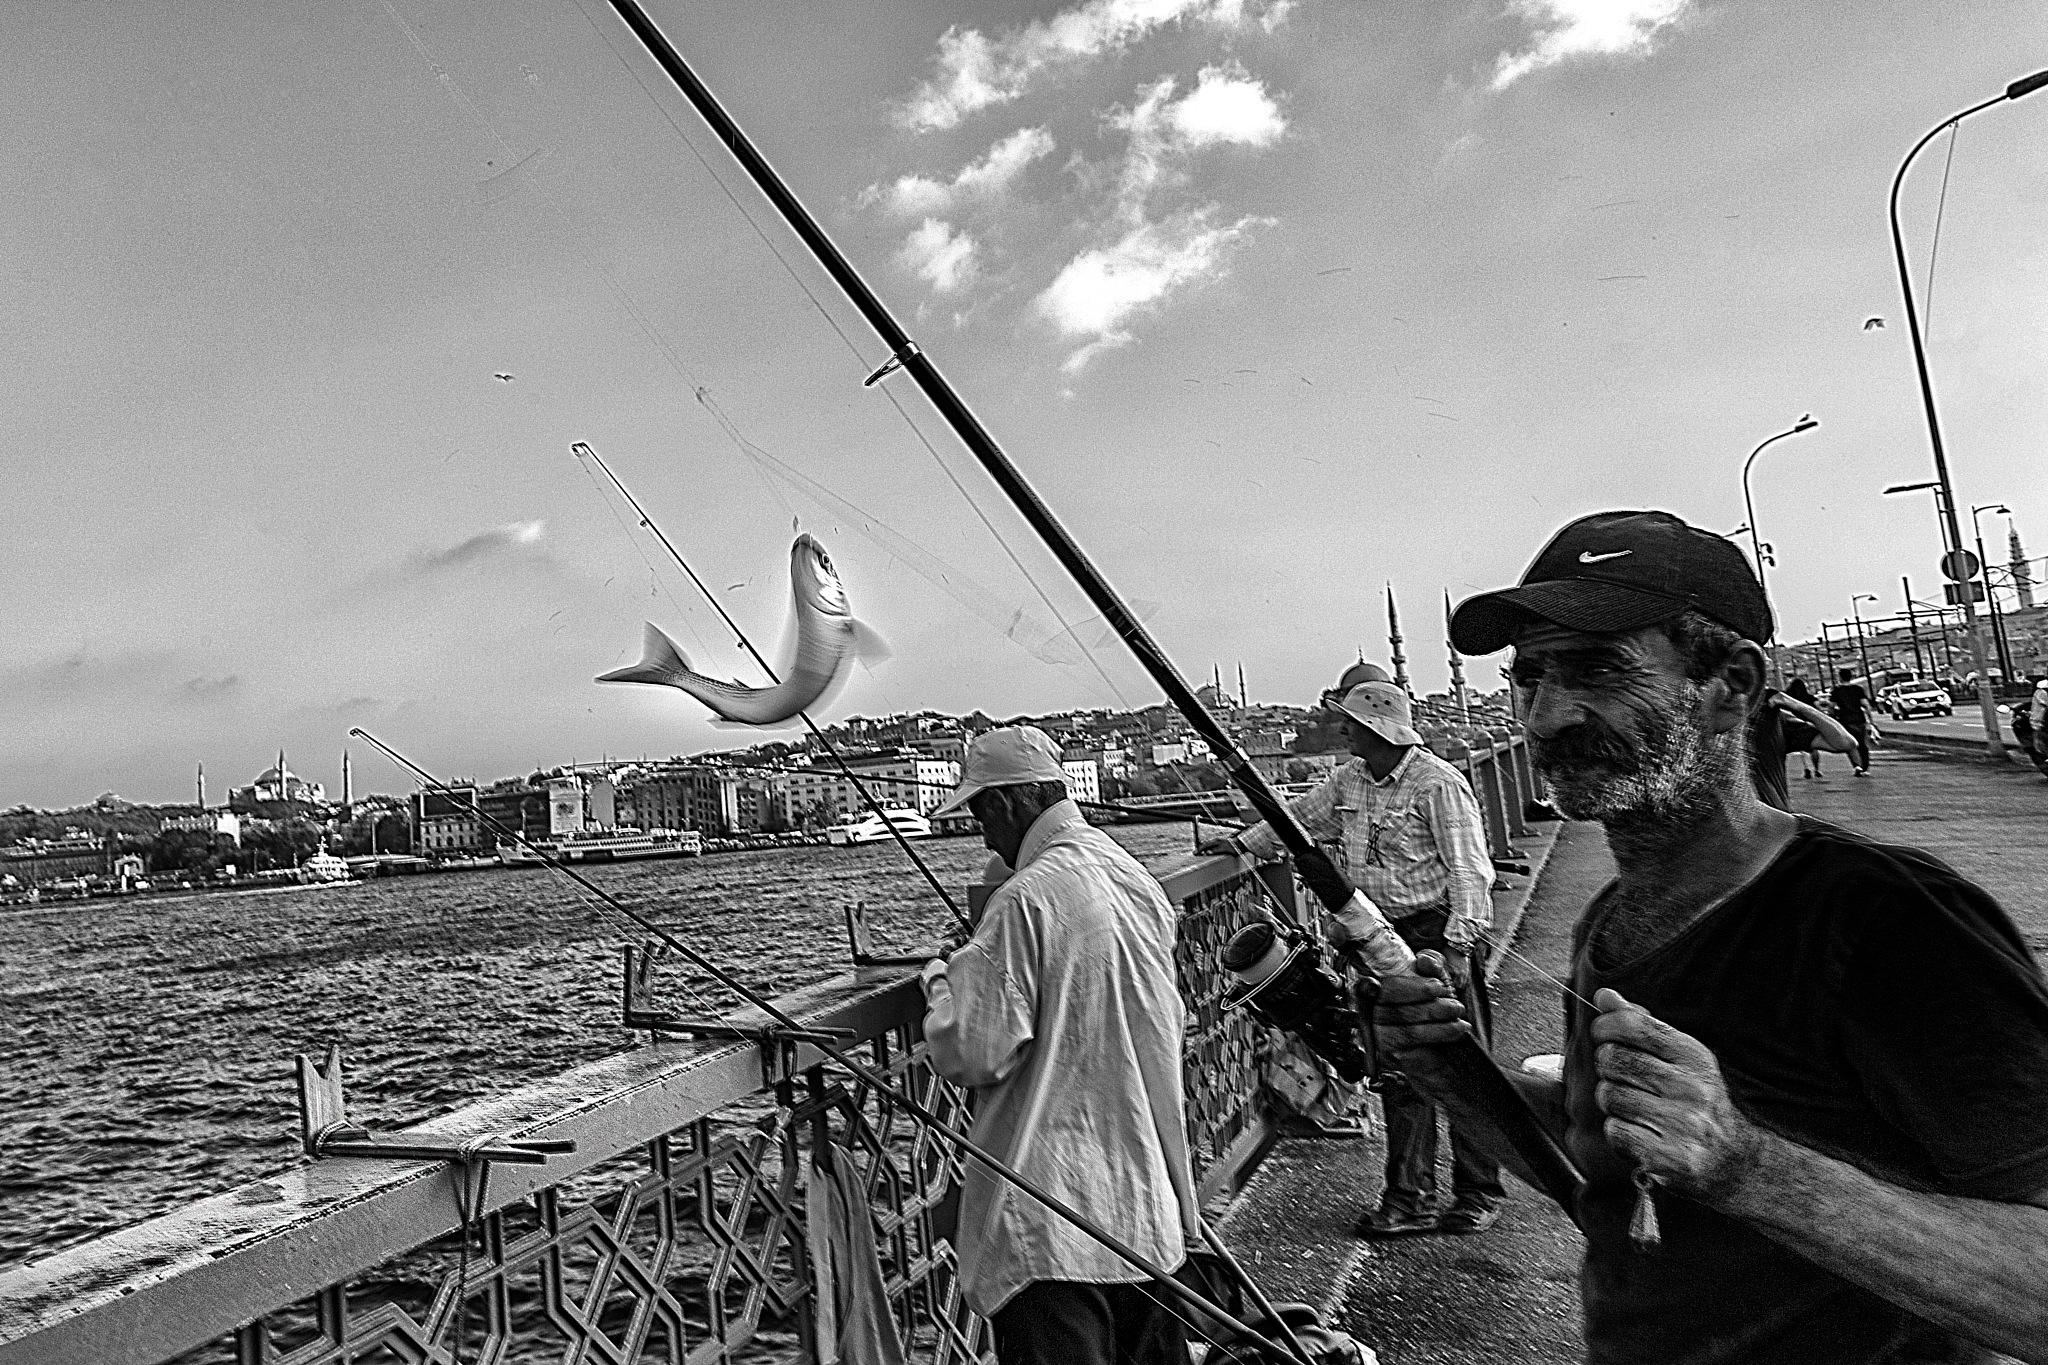 fisherman by erdinc senyurek